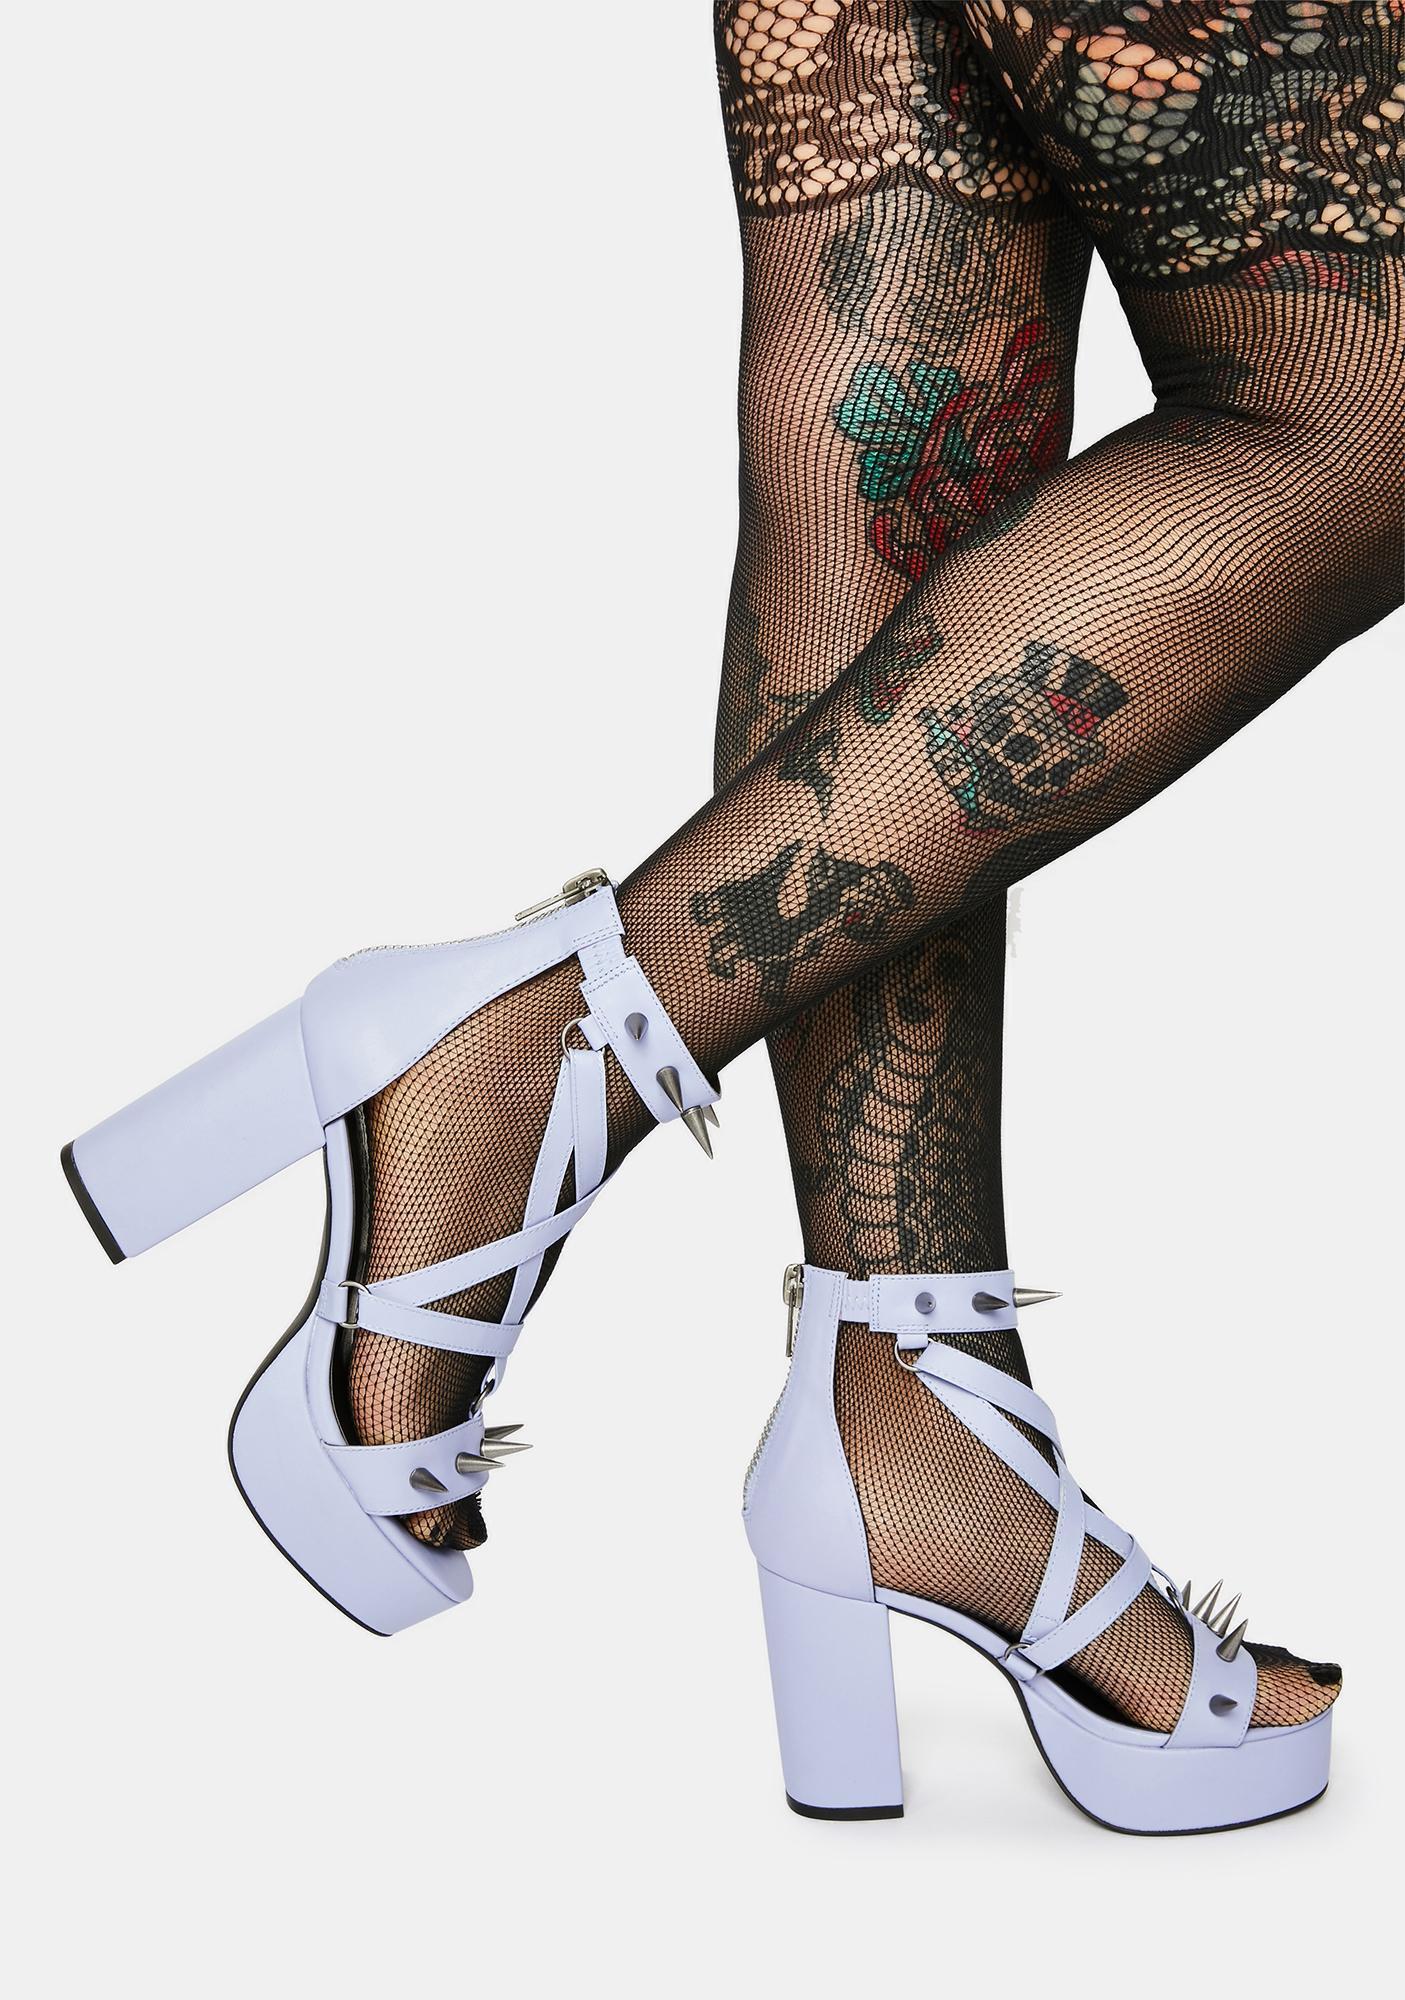 Widow Lilac Killing Me Softly Spiked Heels